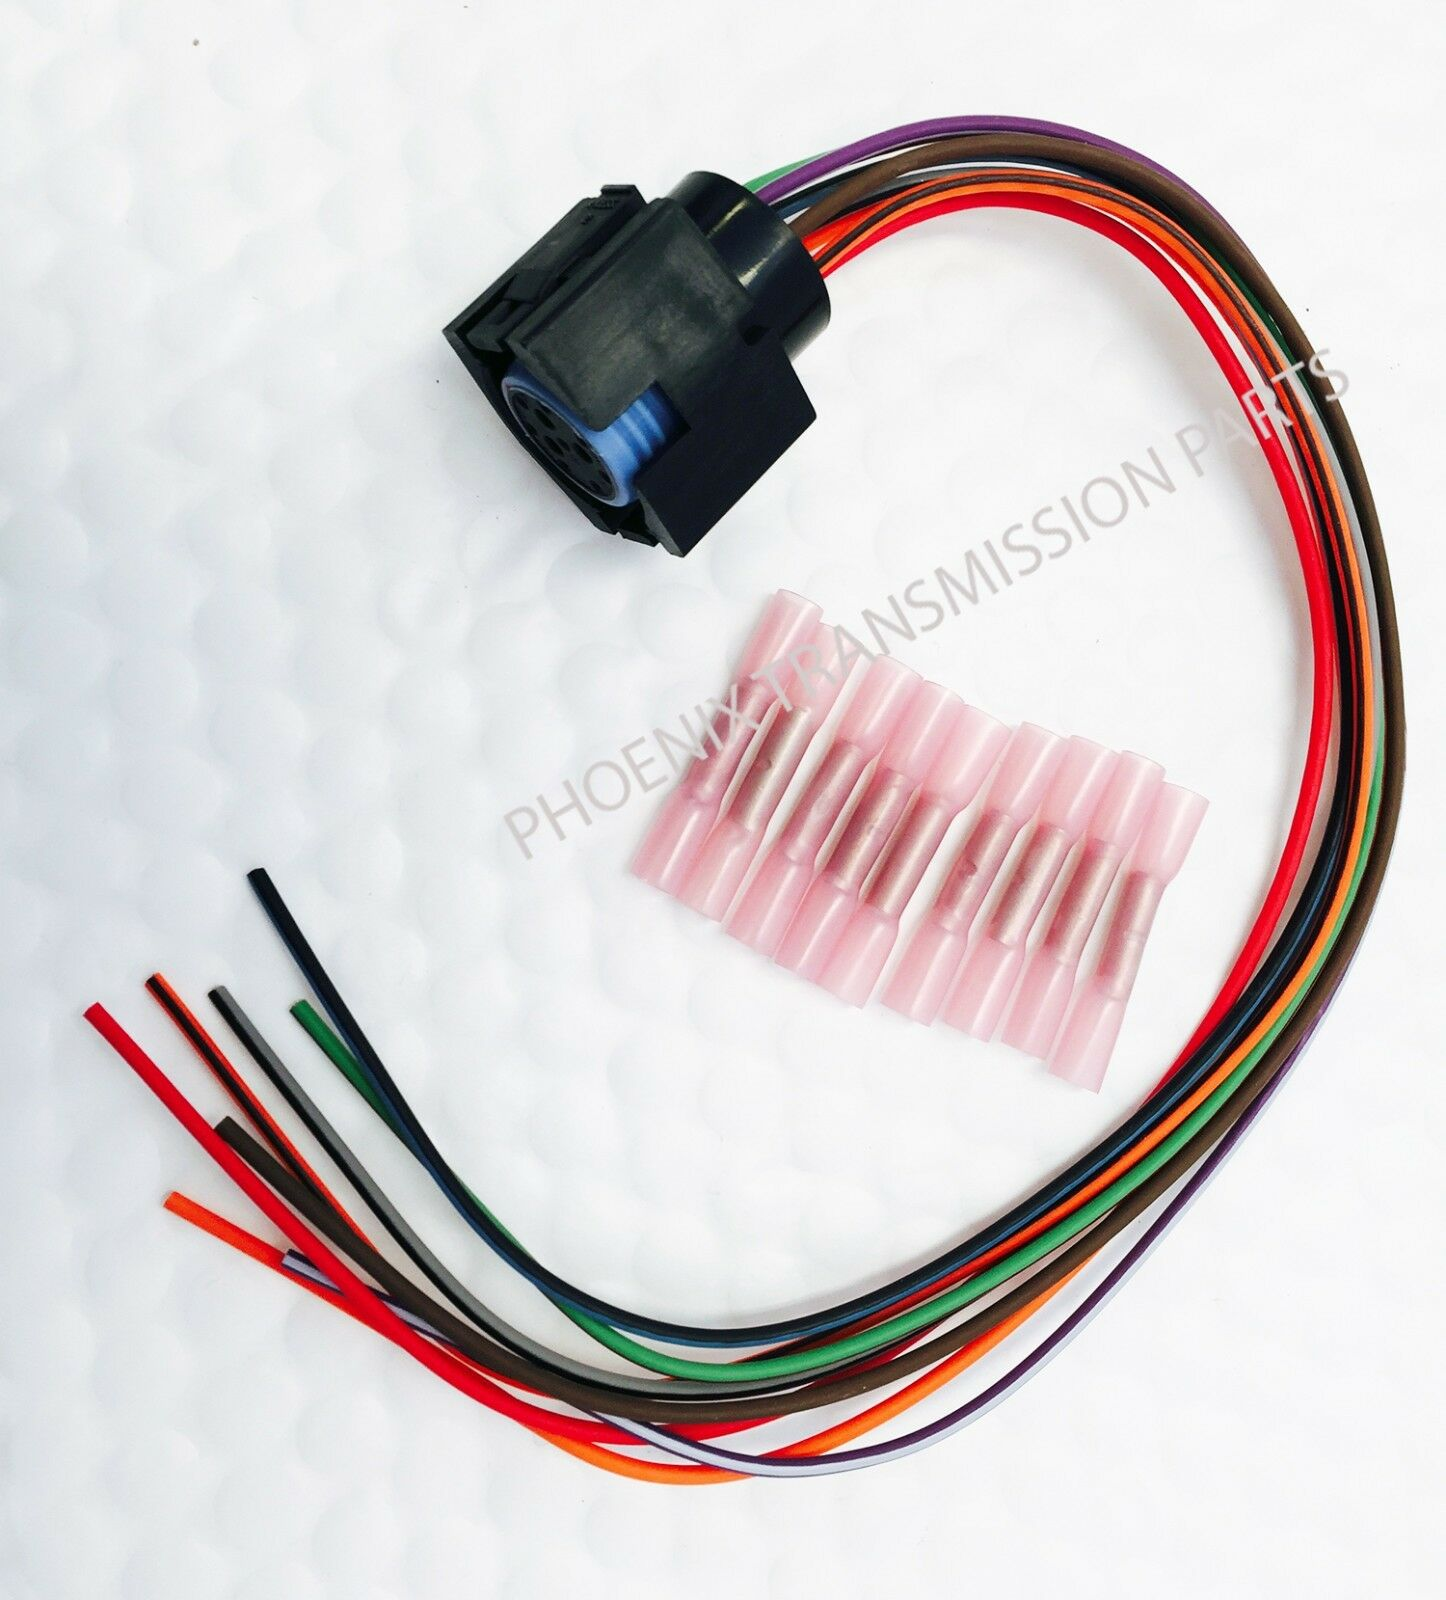 ford 4000 rds wiring diagram nissan pathfinder trailer allison lct transmission harness